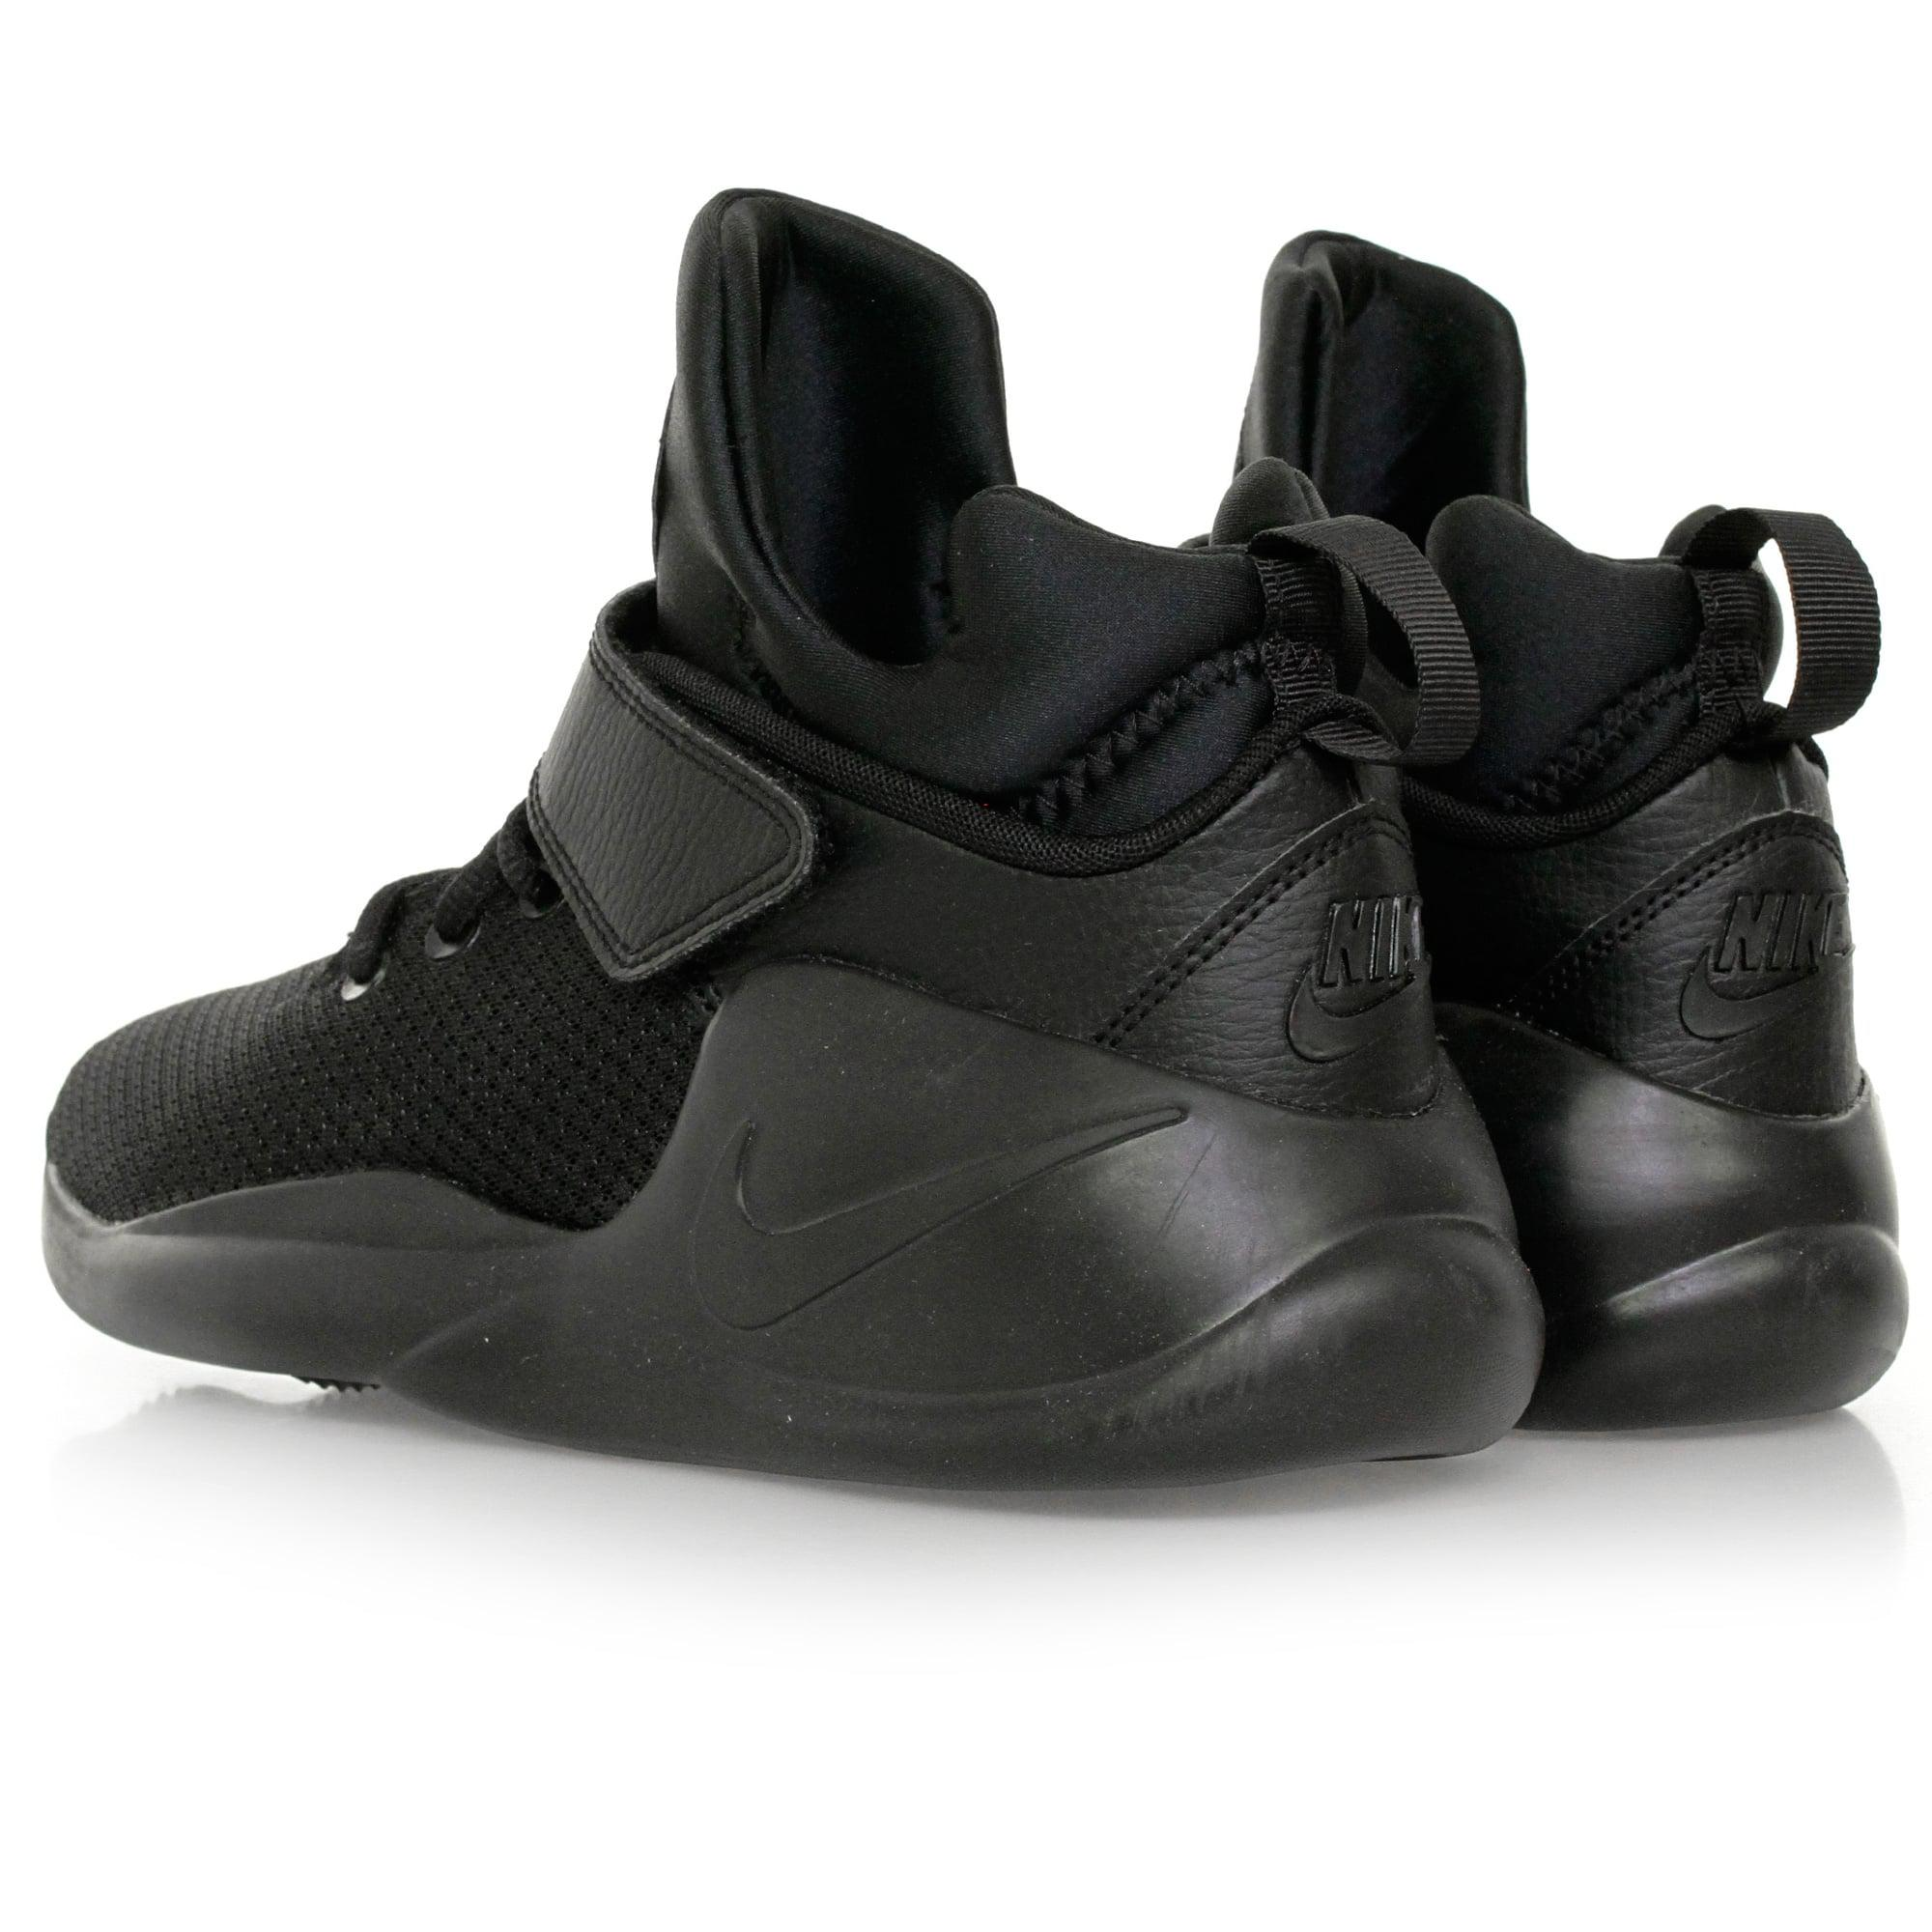 info for e443f 09468 Nike Kwazi Black Shoe 844839 001 in Black for Men - Lyst